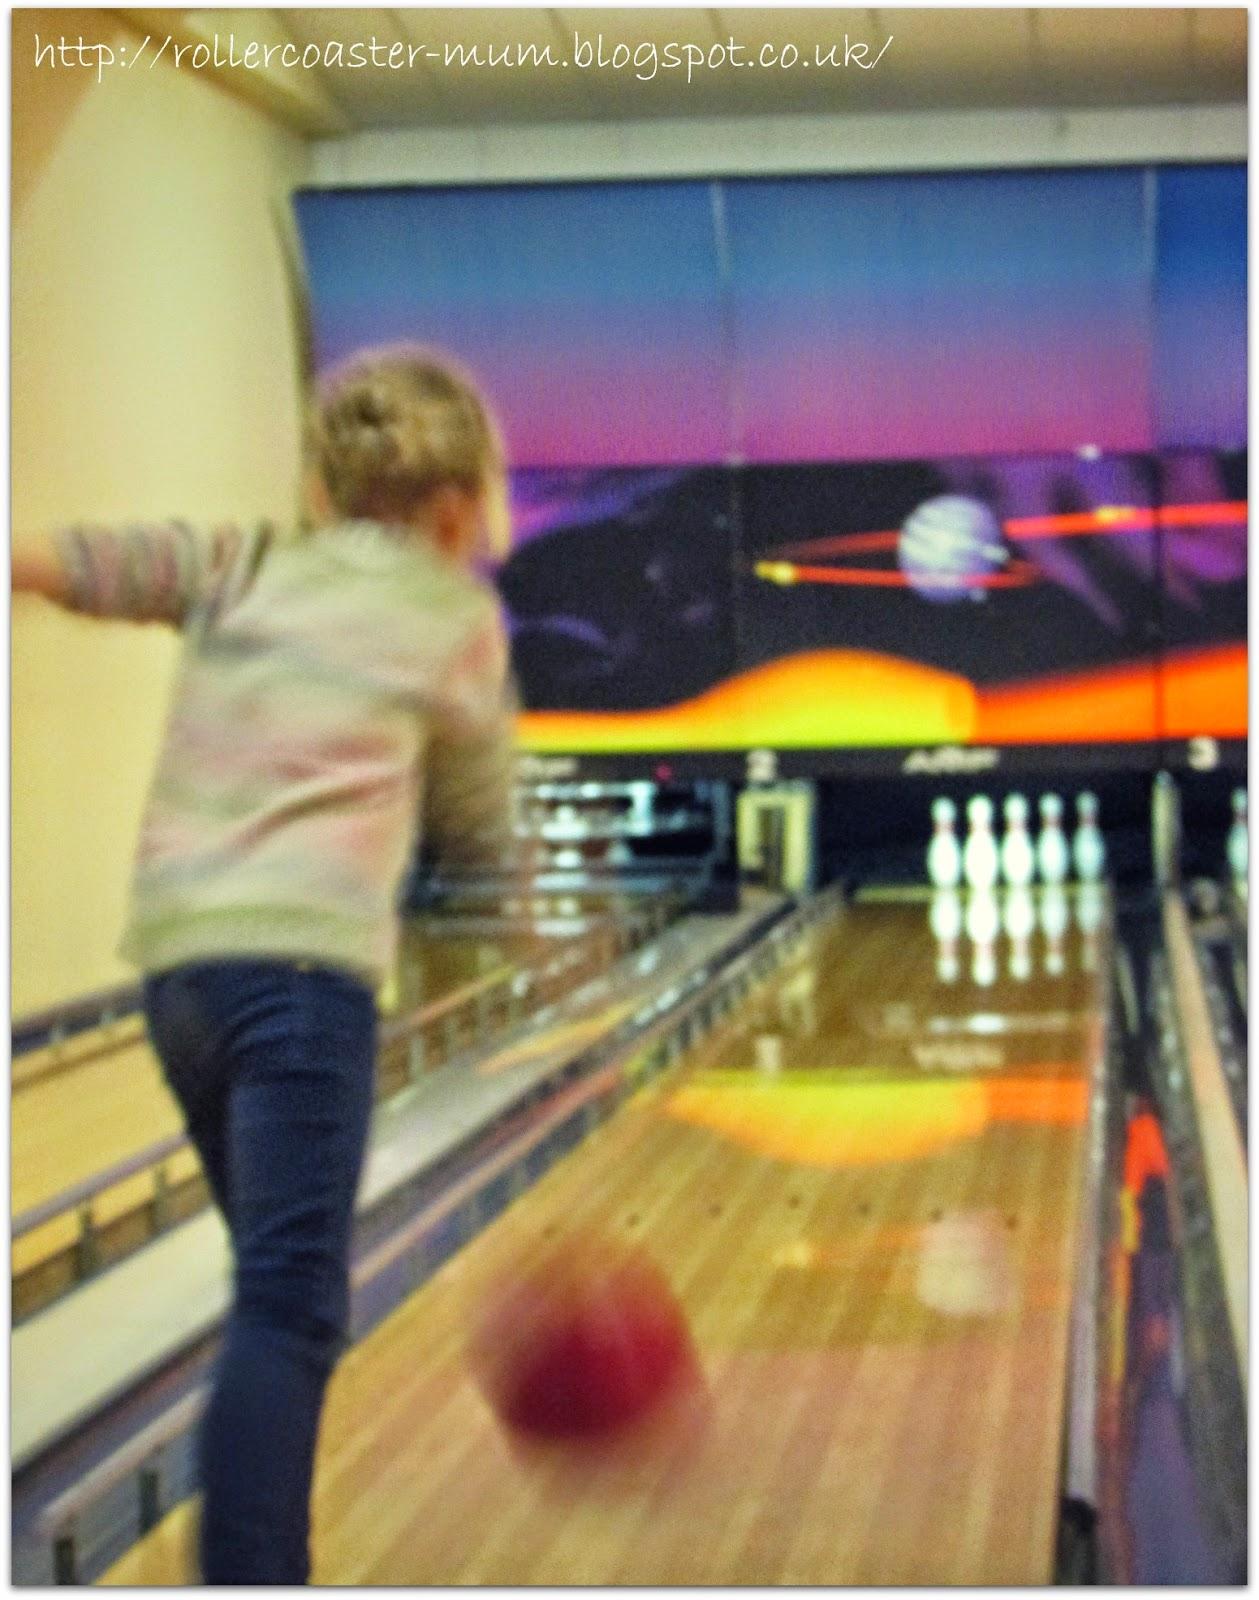 bowling a spare, MFA Bowl Chichester